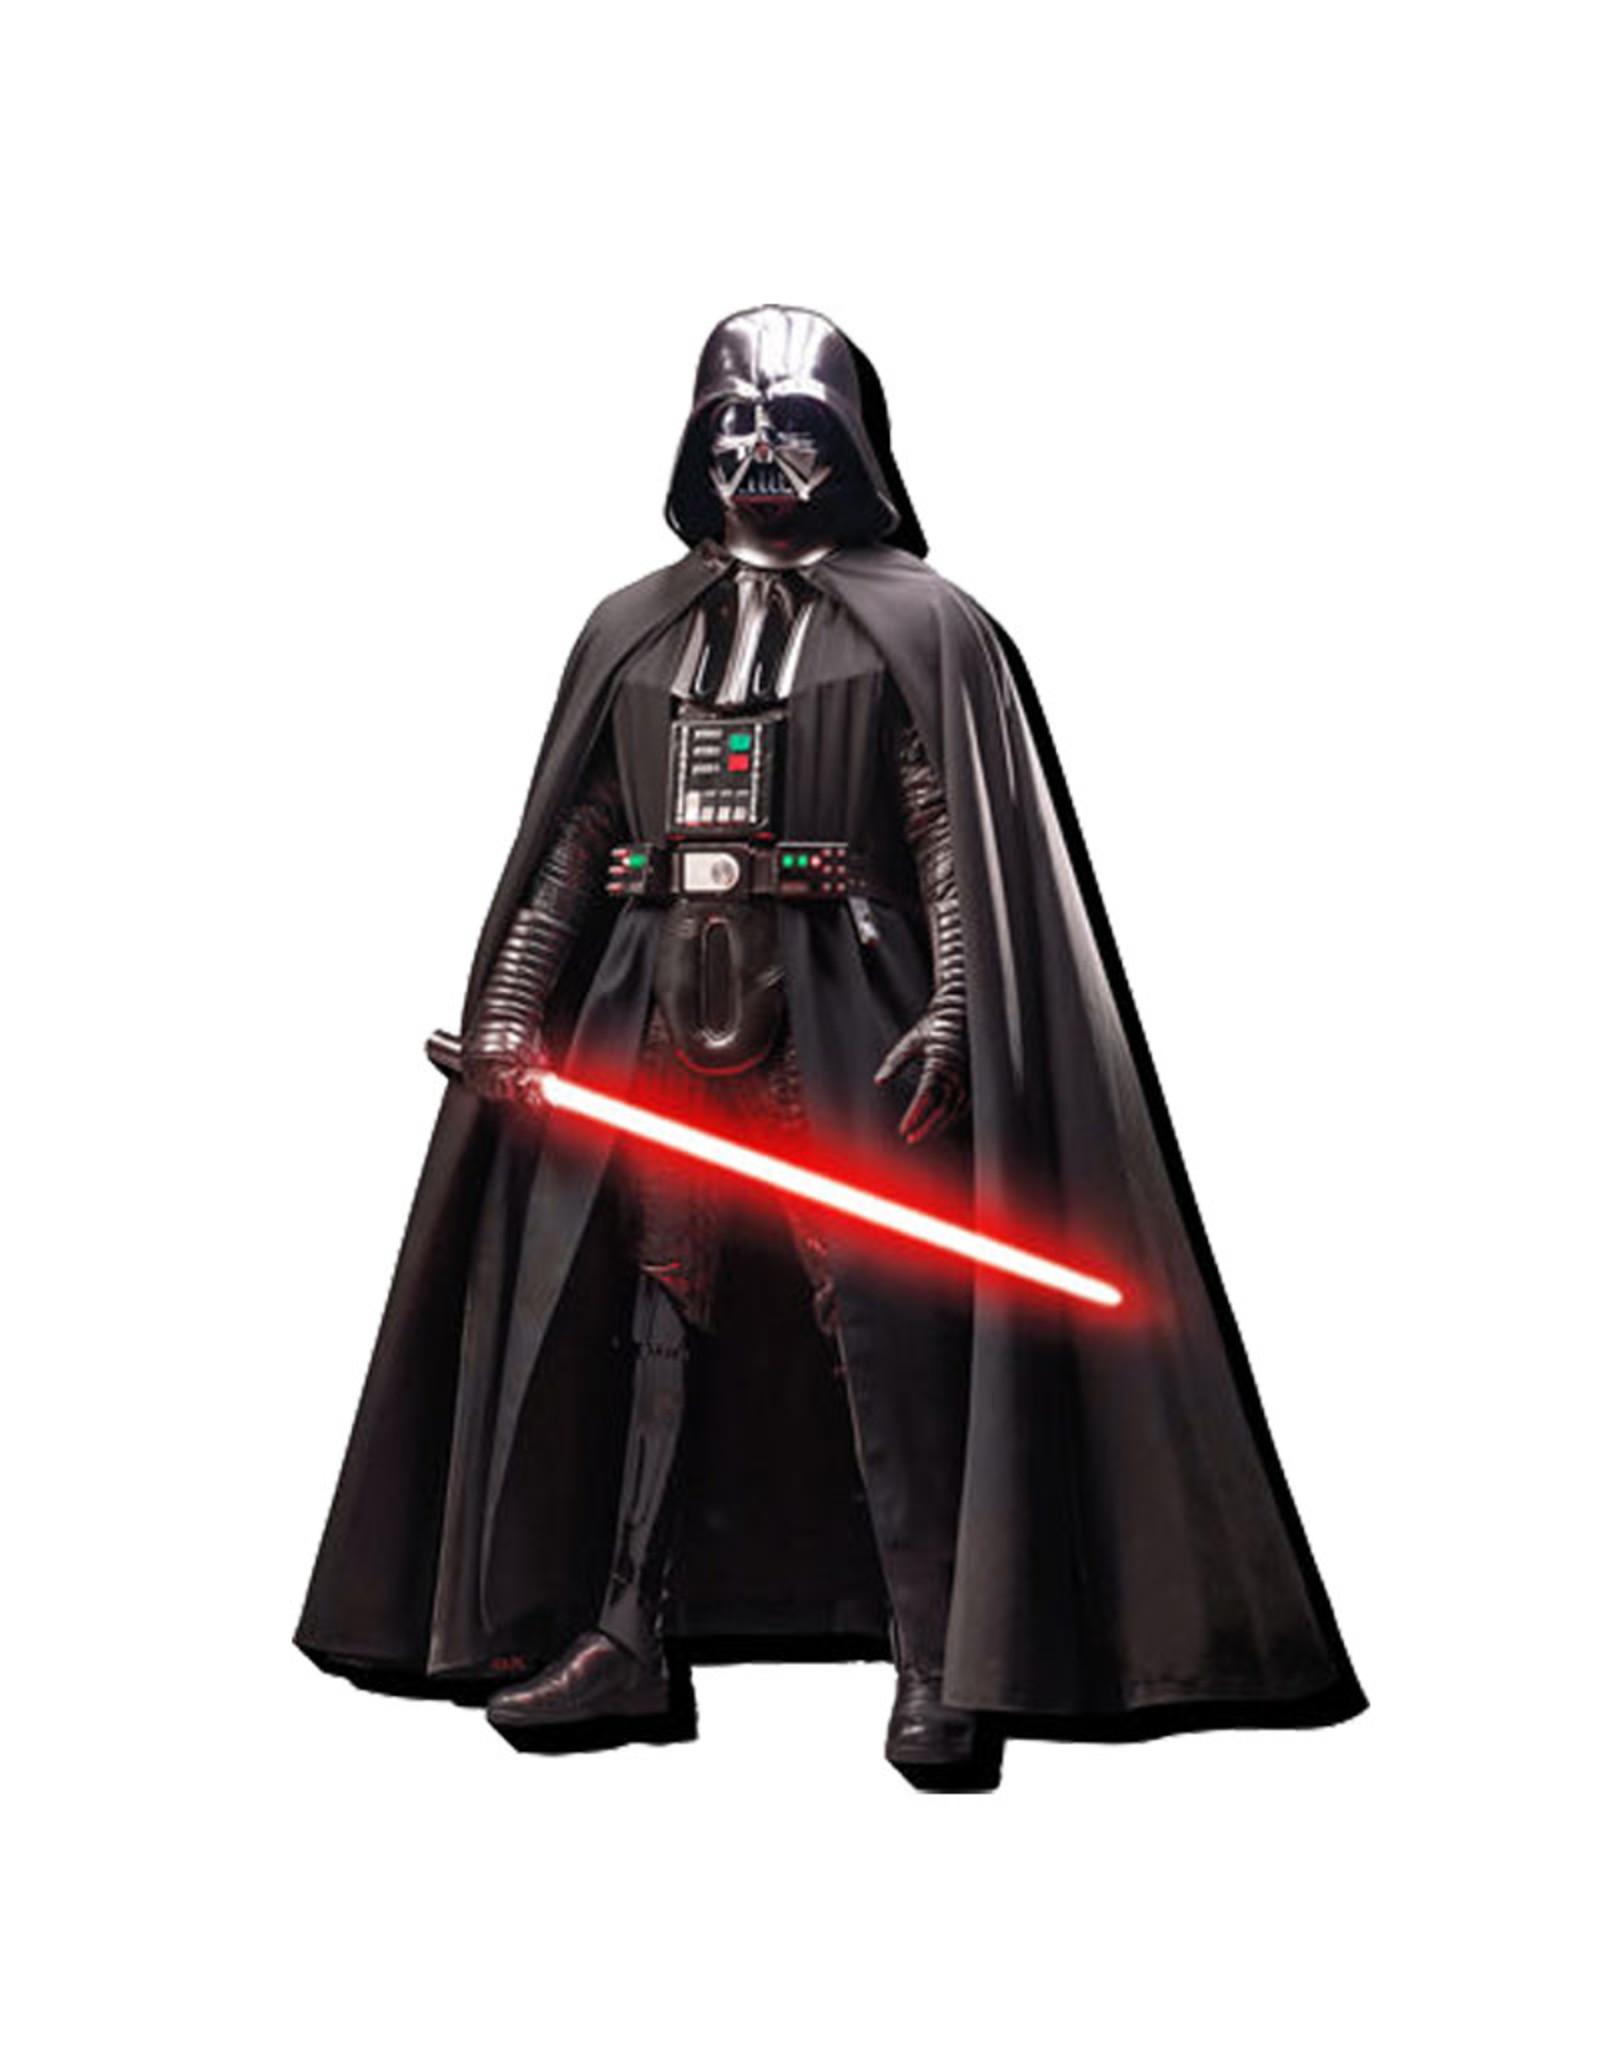 Star Wars Star Wars ( Magnet ) Darth Vader